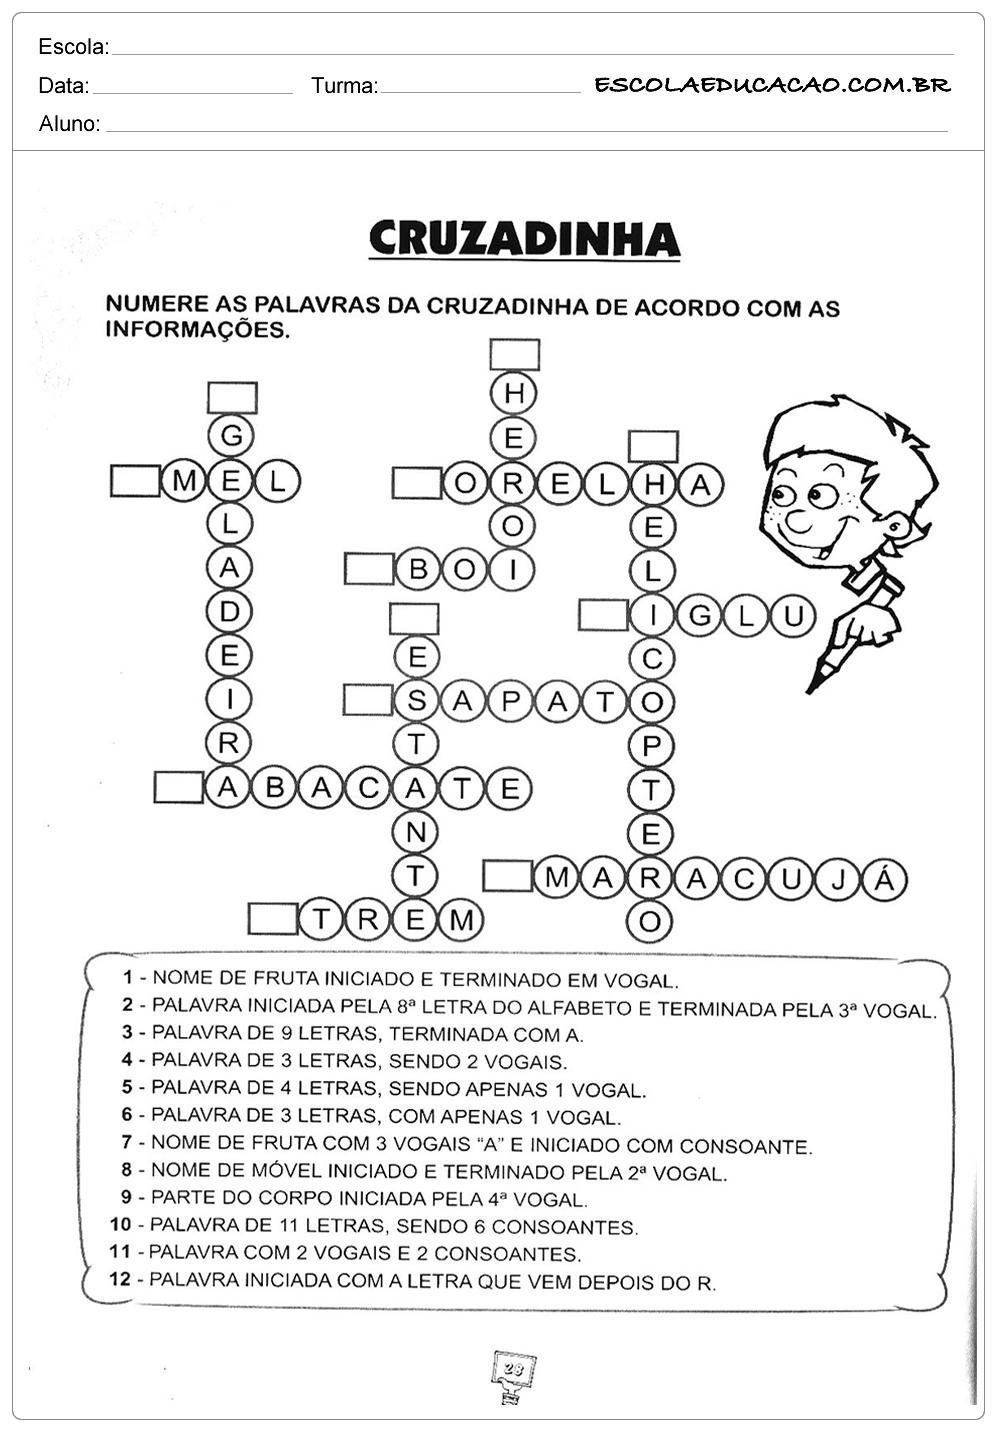 Cruzadinha